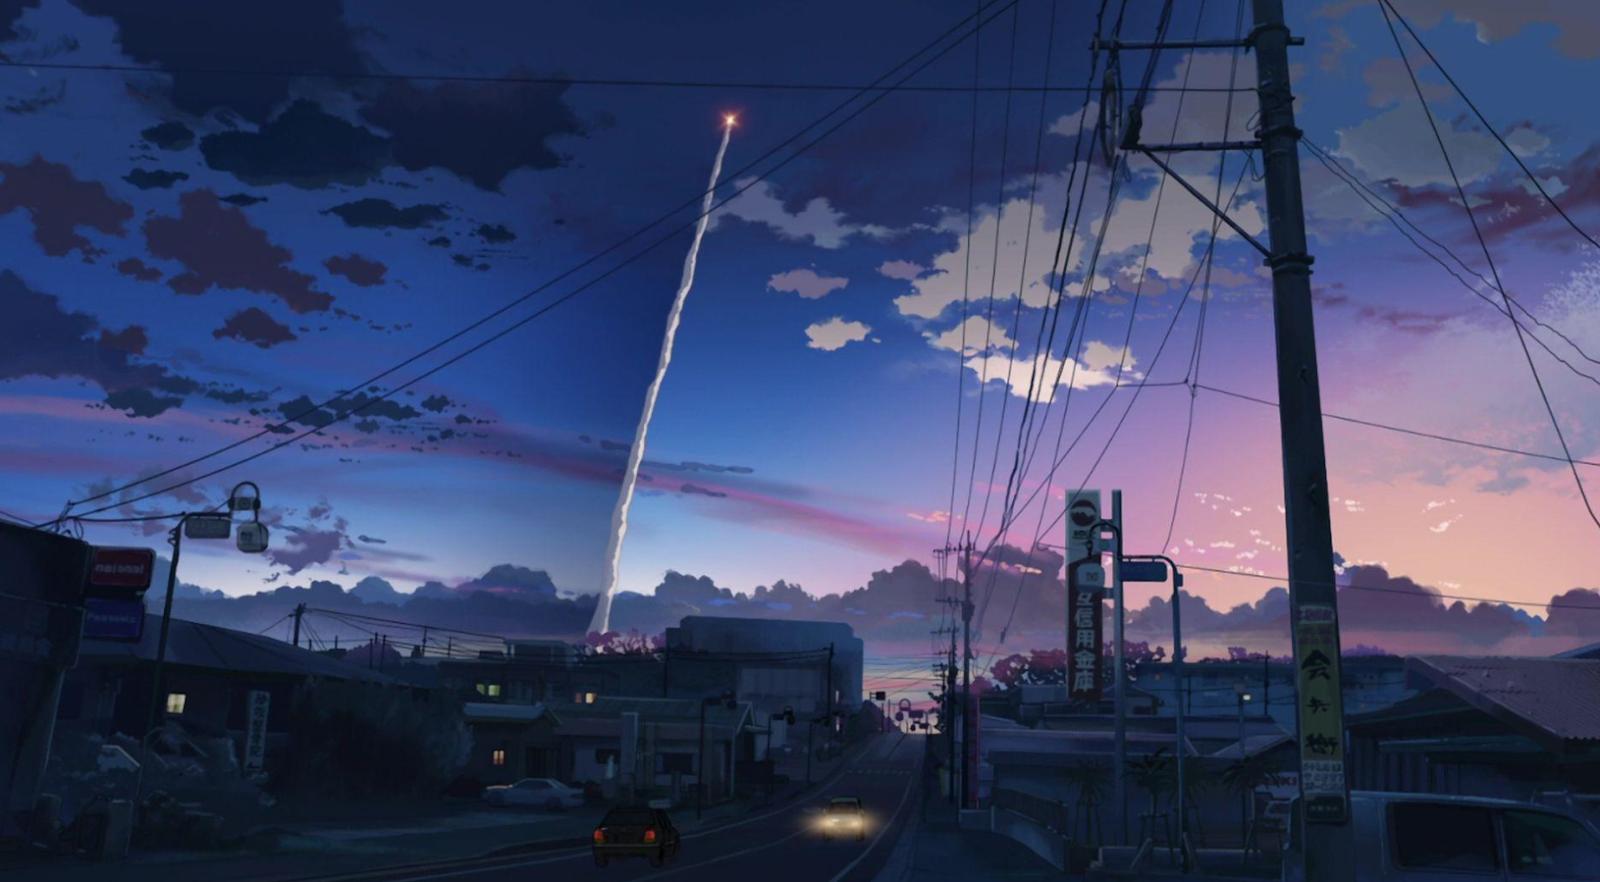 Anime Wallpapers Aesthetic HD for Homescreen & Lockscreen